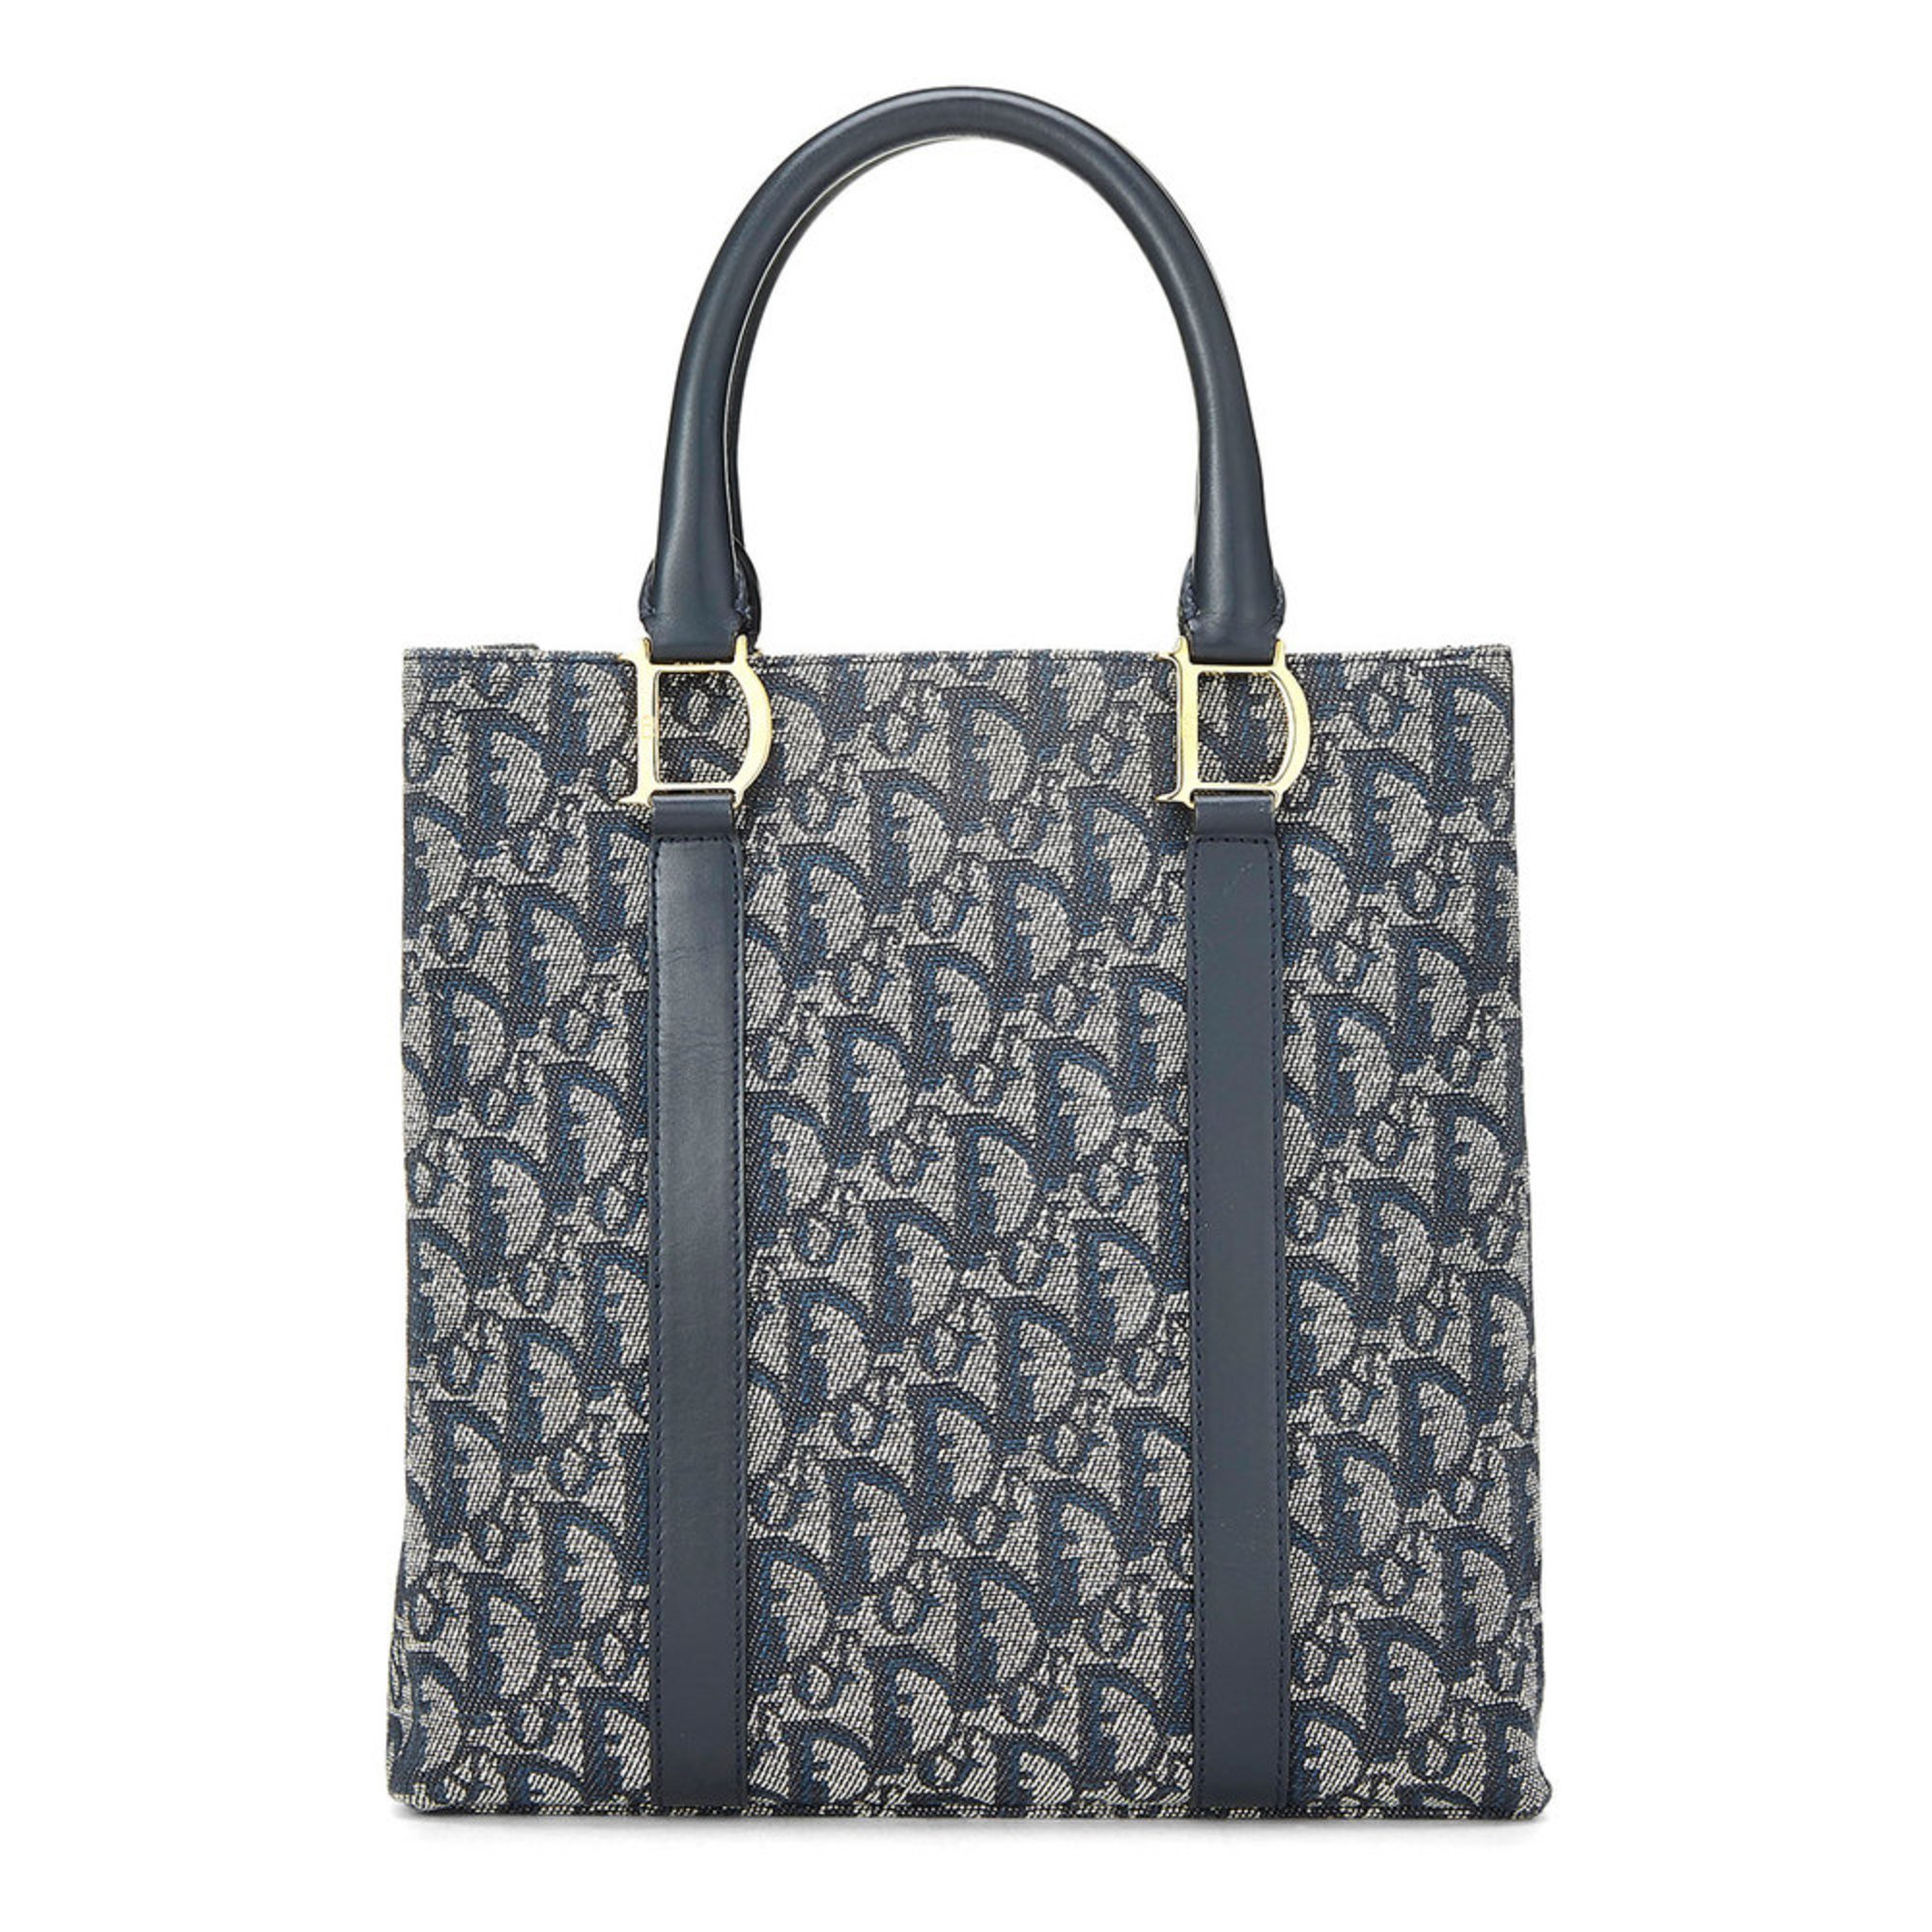 9b43182754c9 Dior Canvas Handbag Navy